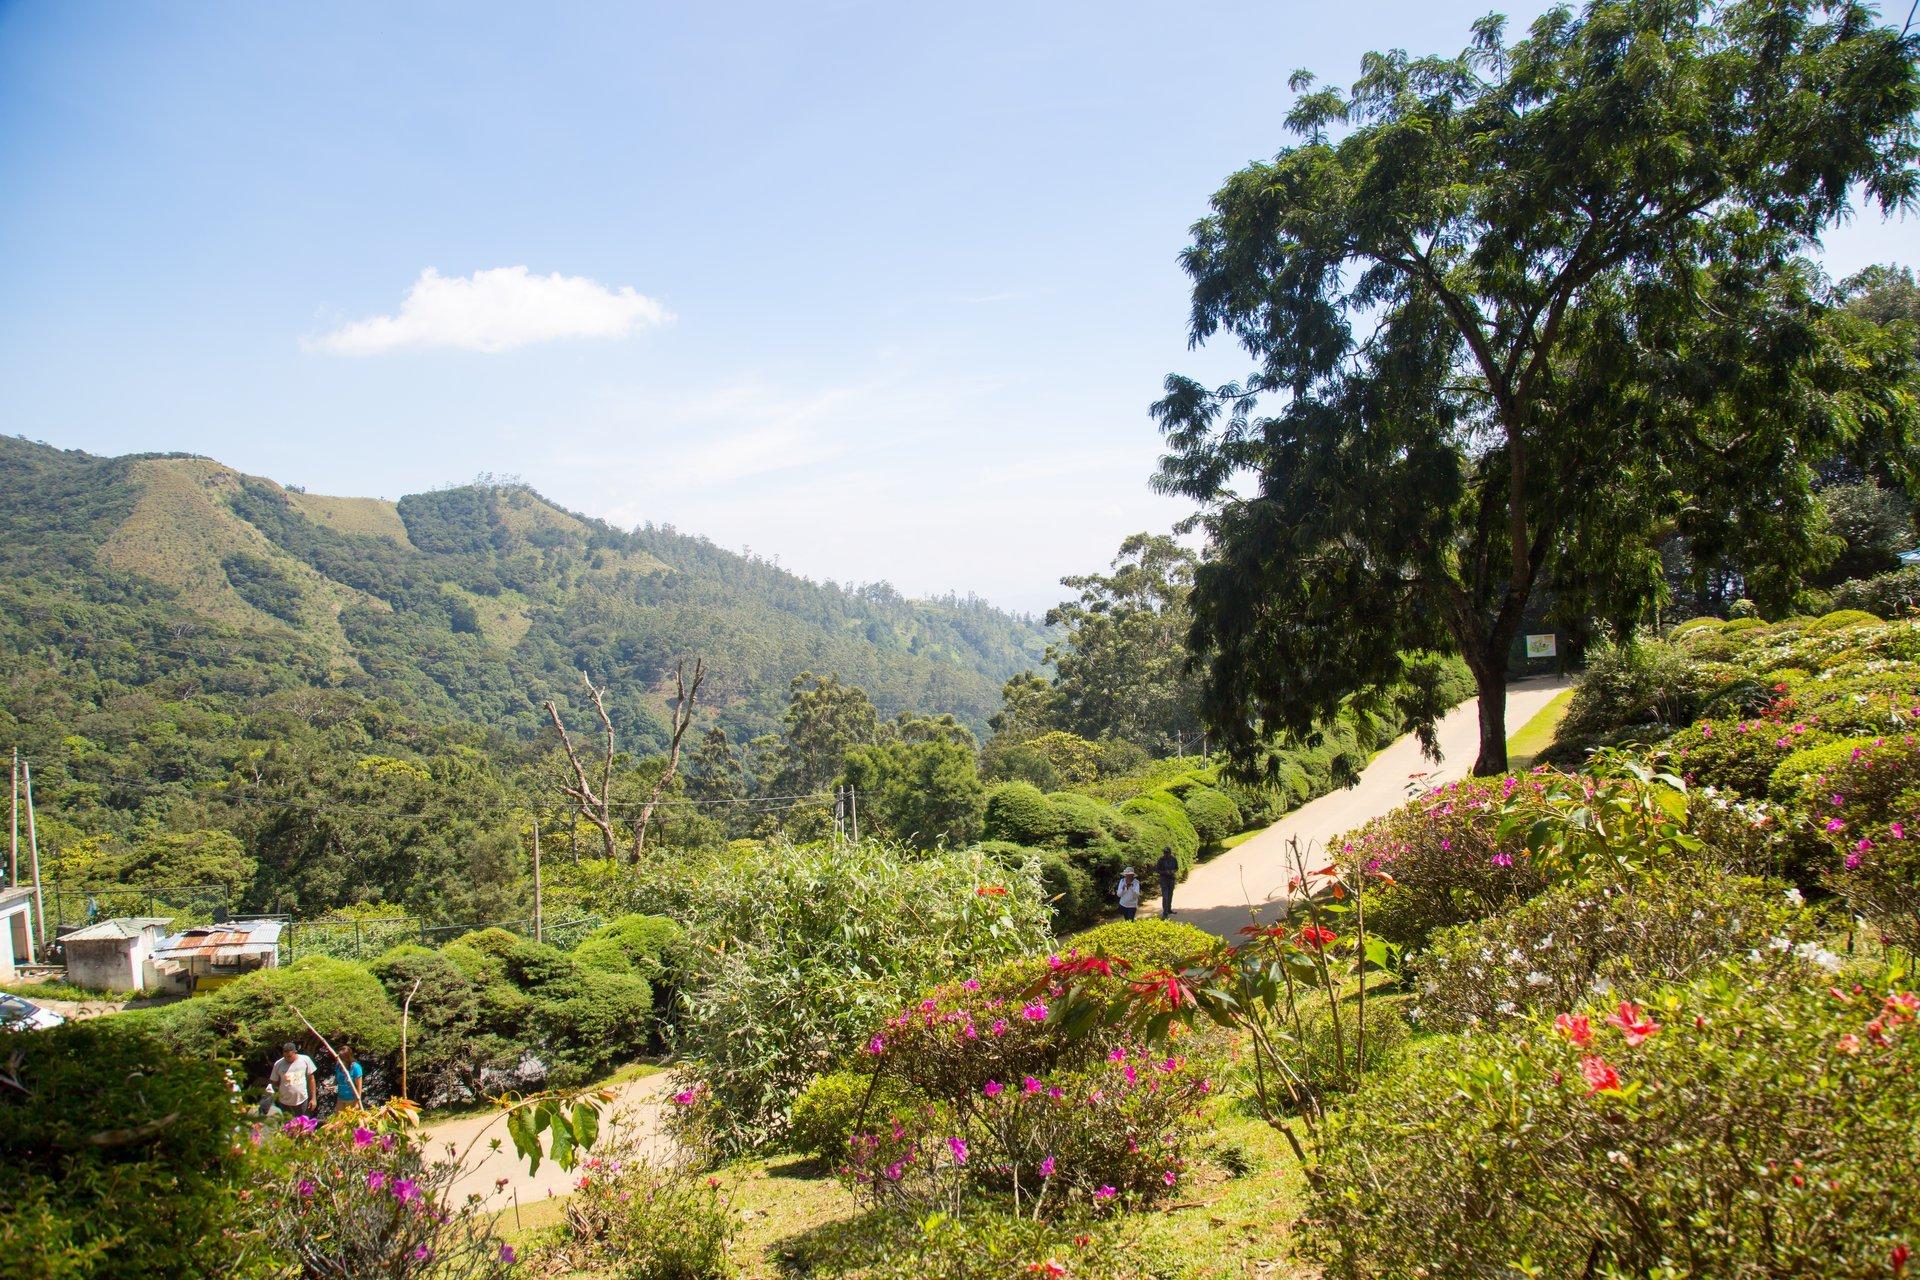 Hakgala Botanical Gardens in Sri Lanka 2020 - Best Time